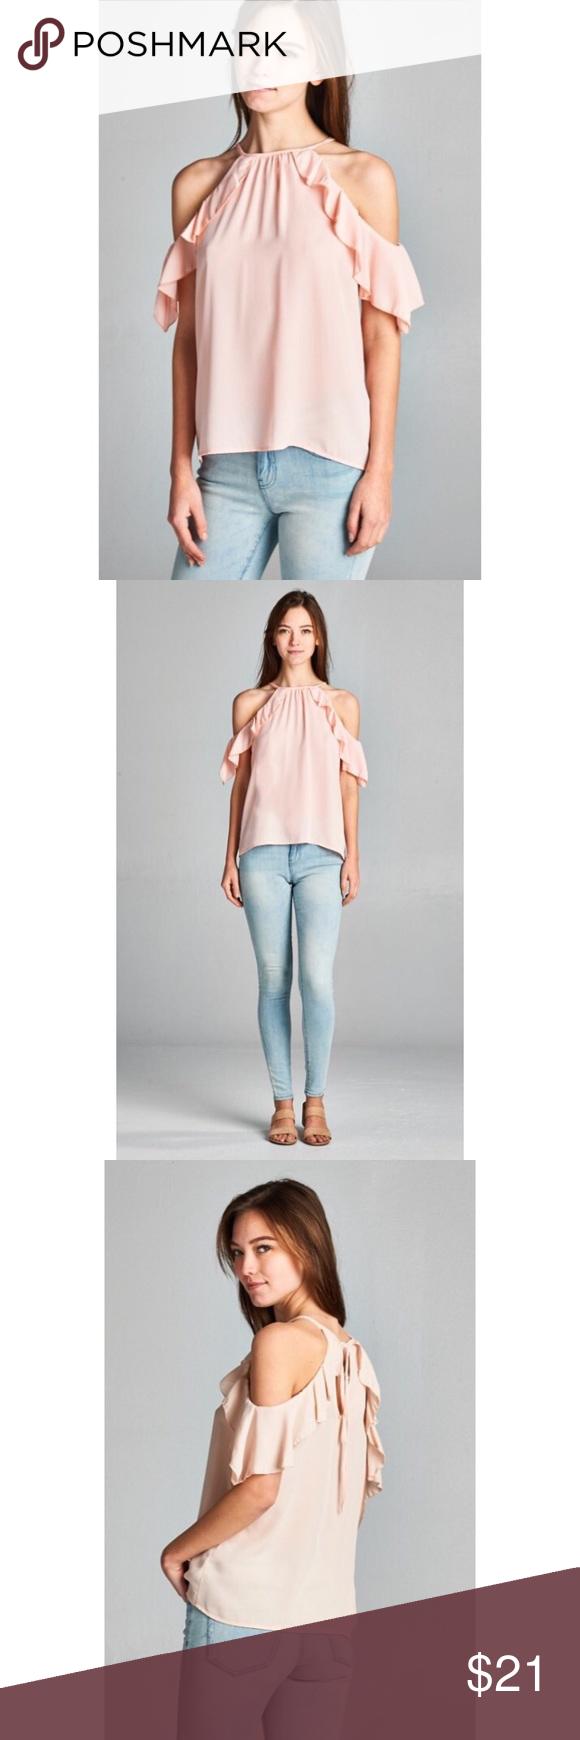 1a57a879e08965 ❗️CLEARANCE❗️Pink Ruffle Cold Shoulder Tunic S M L Blush pink ruffle cold  shoulder tunic top